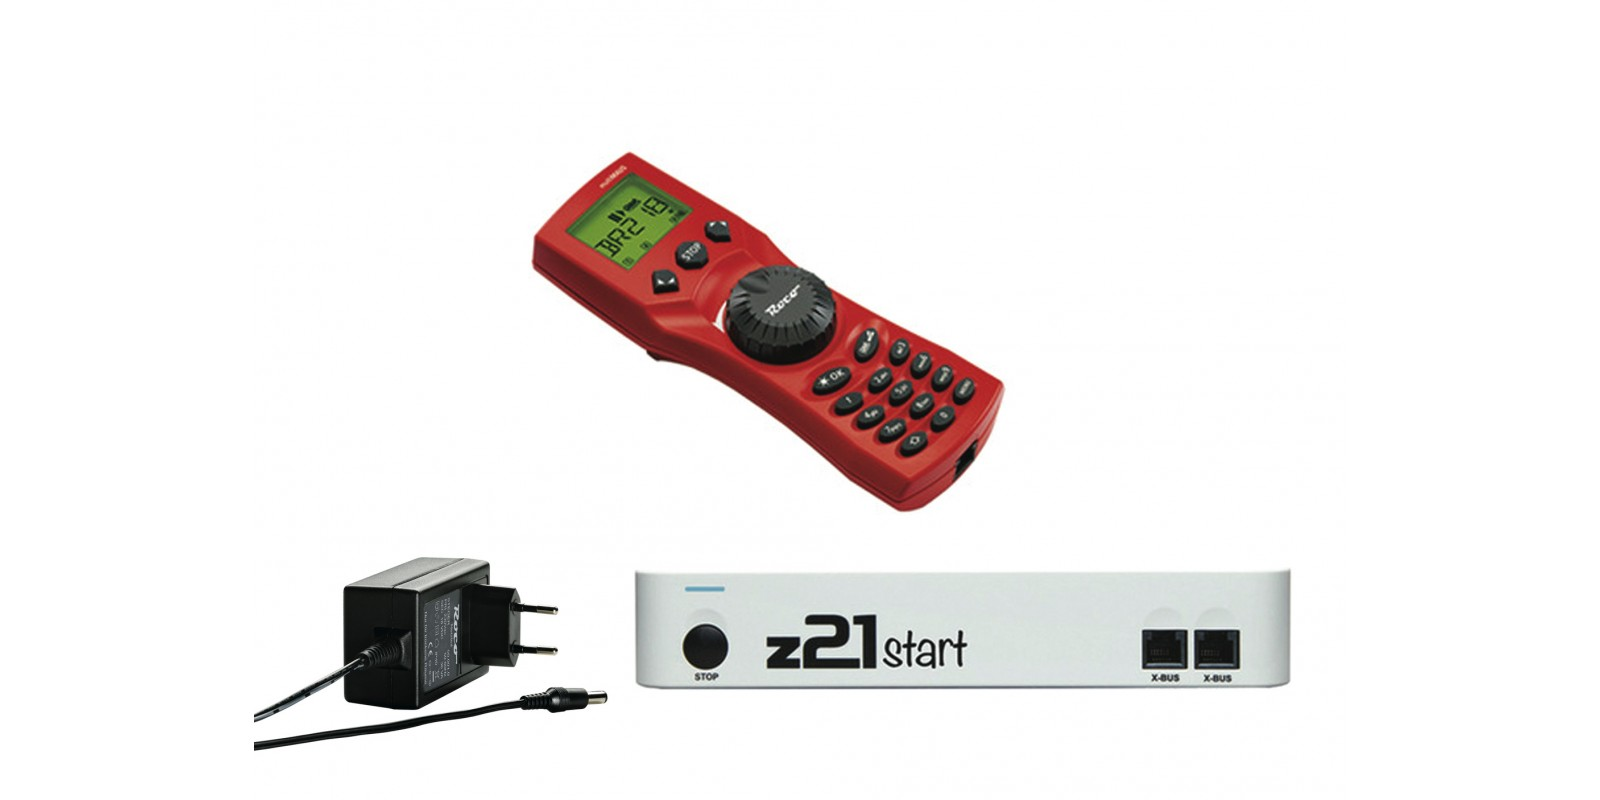 RO10833 - z21 start base digital set